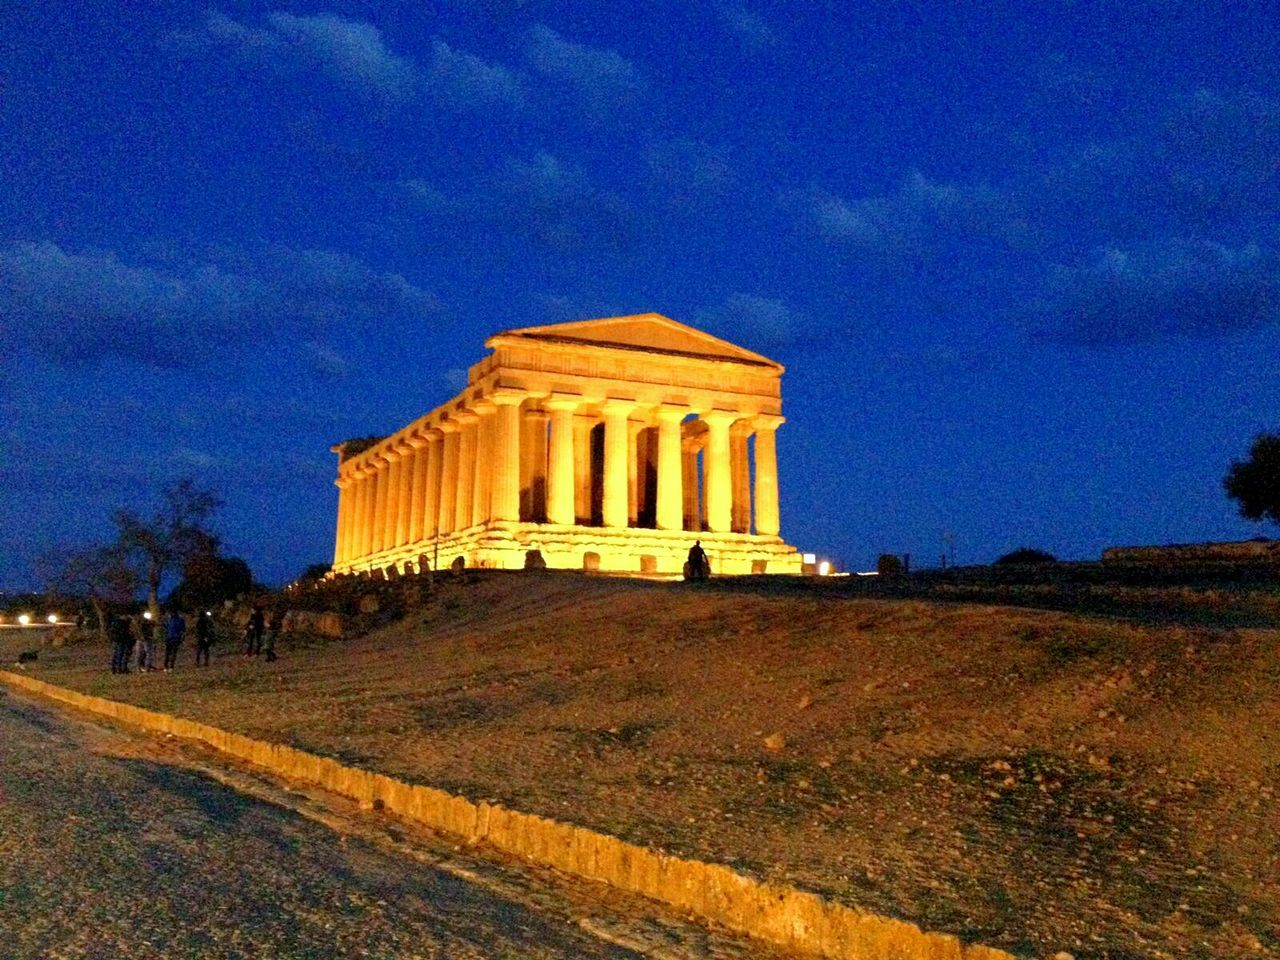 Valle Dei Templi Agrigento History EyeEmBestPics Architecture Greek Sicily ❤️❤️❤️ Sicilia